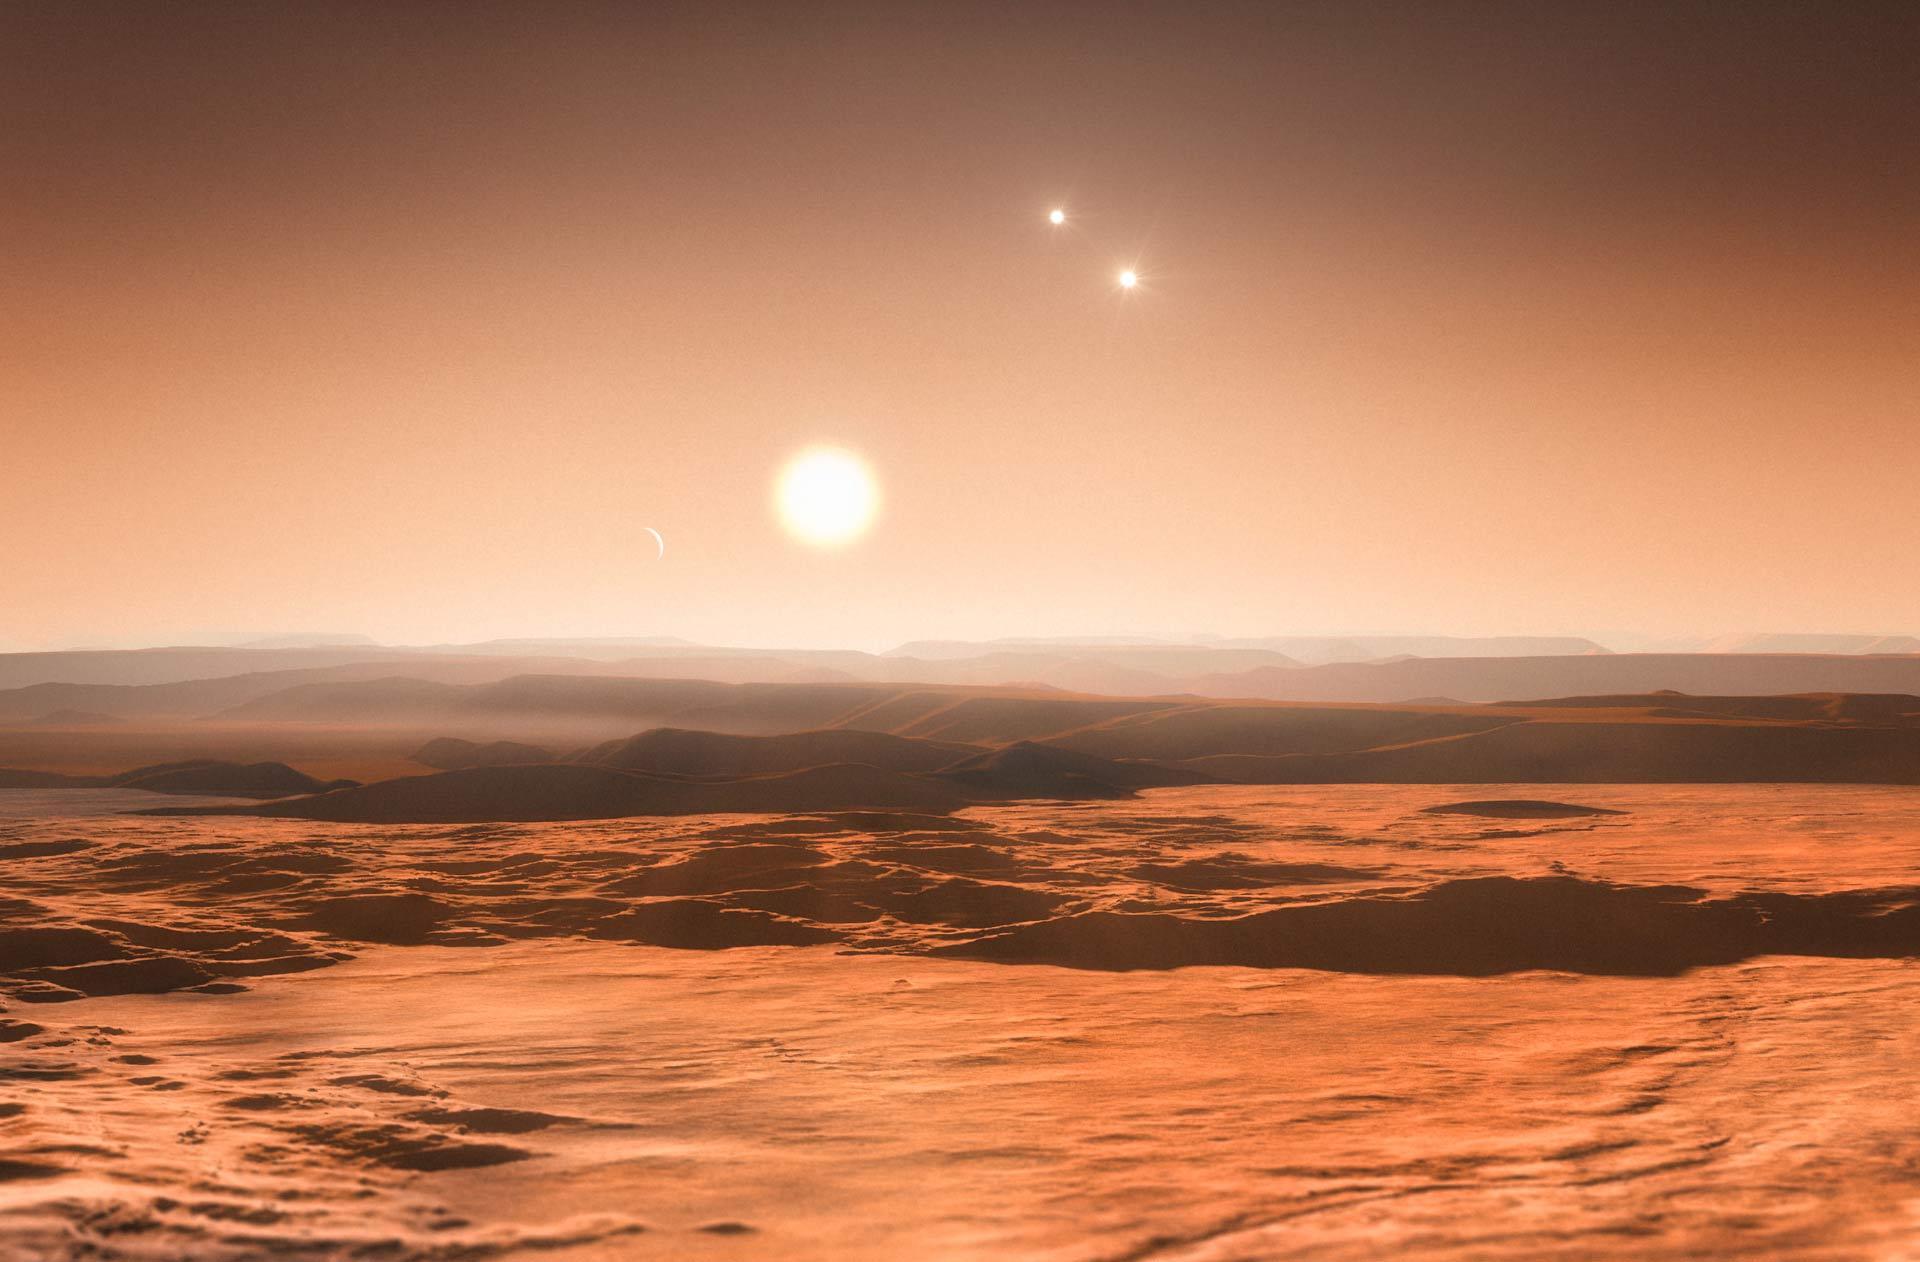 Planeta con tres soles